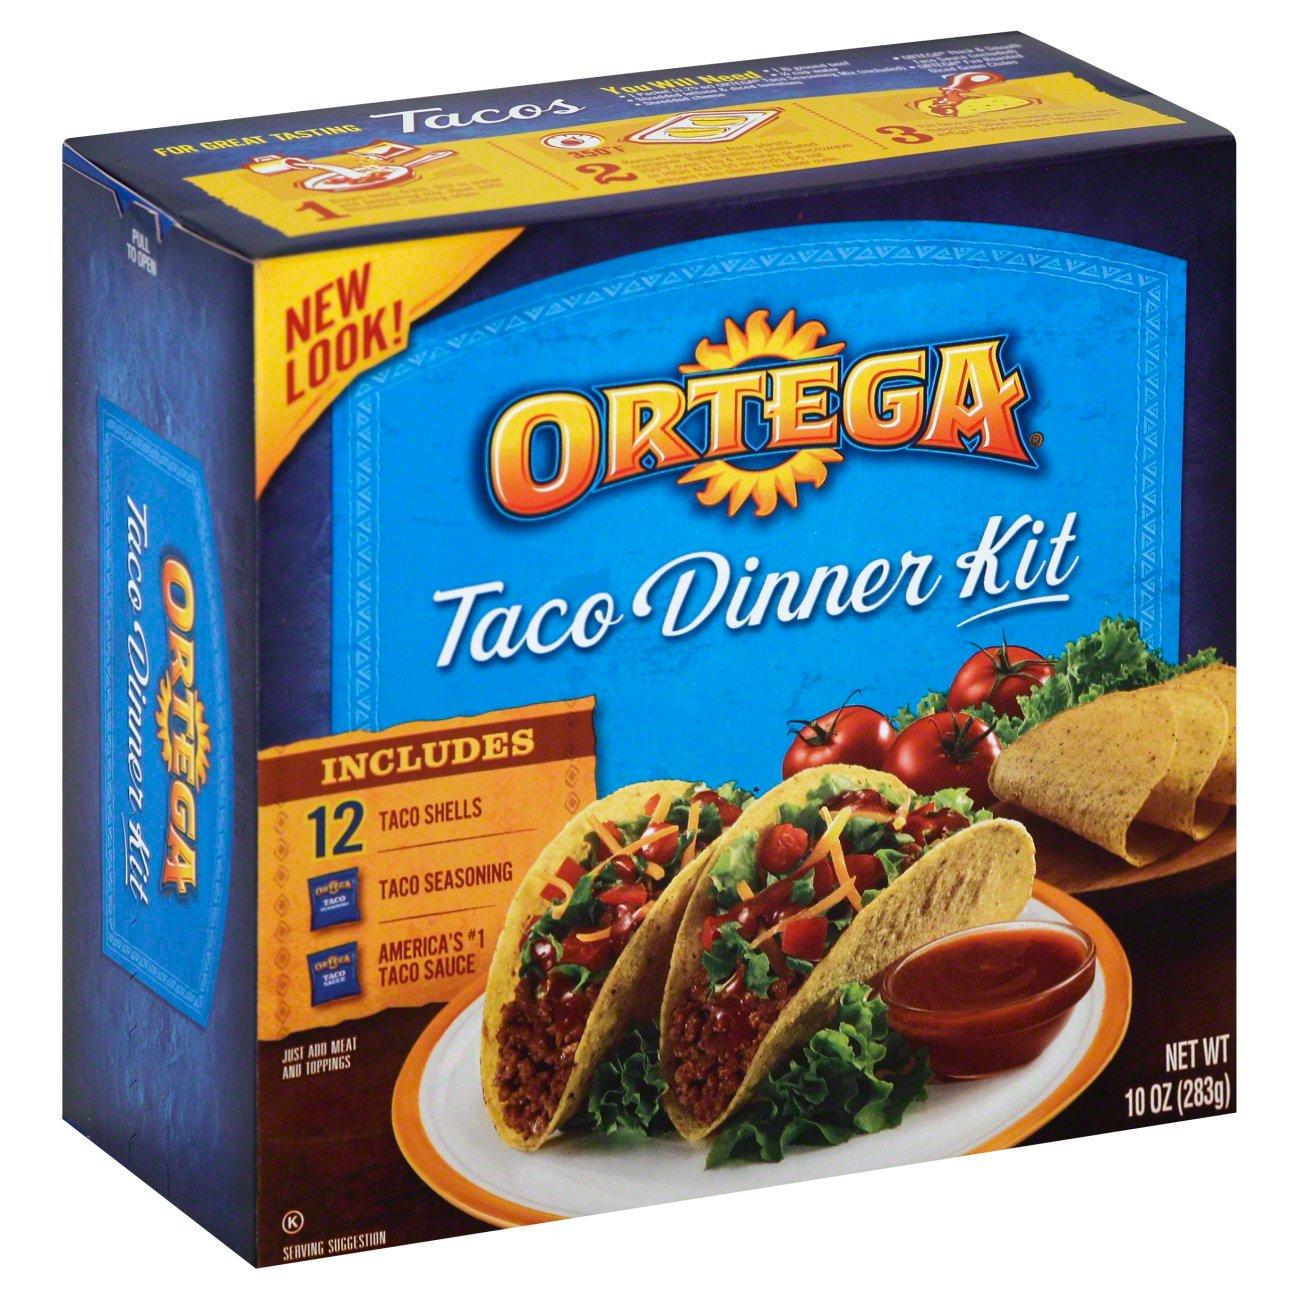 Ortega Taco Dinner Kit Shop Pantry Meals At H E B